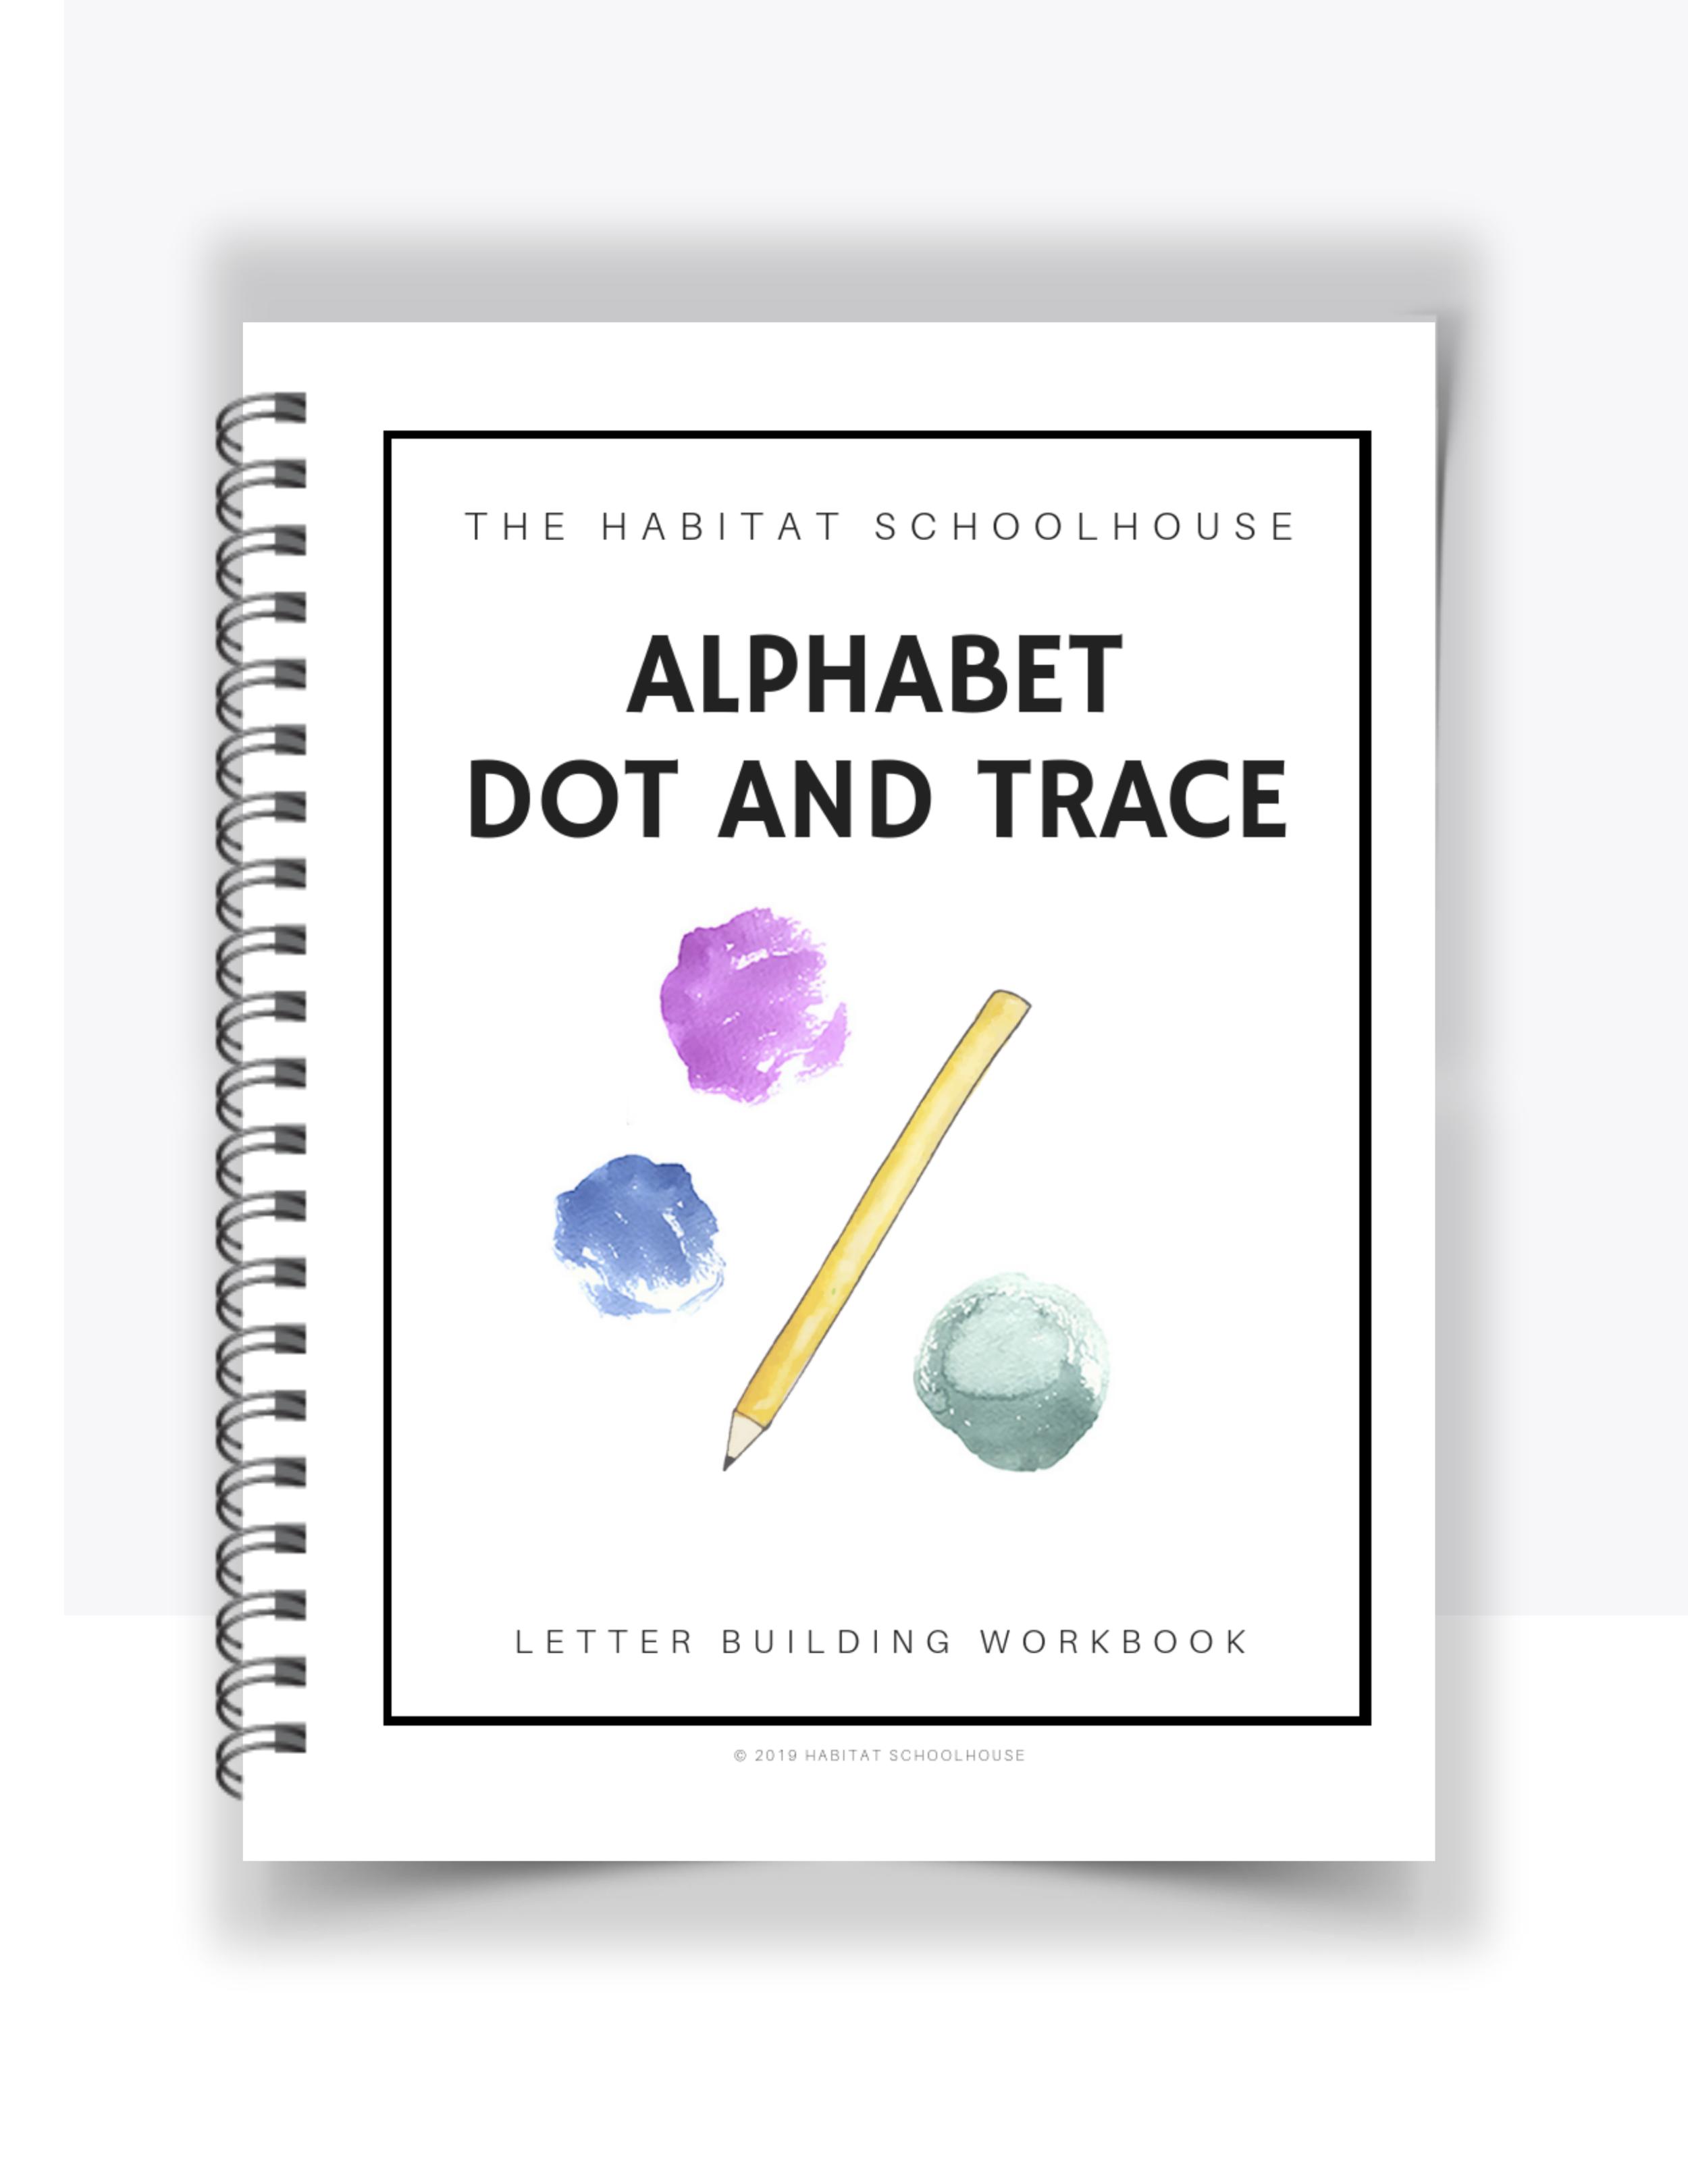 Alphabet Dot and Trace Workbook